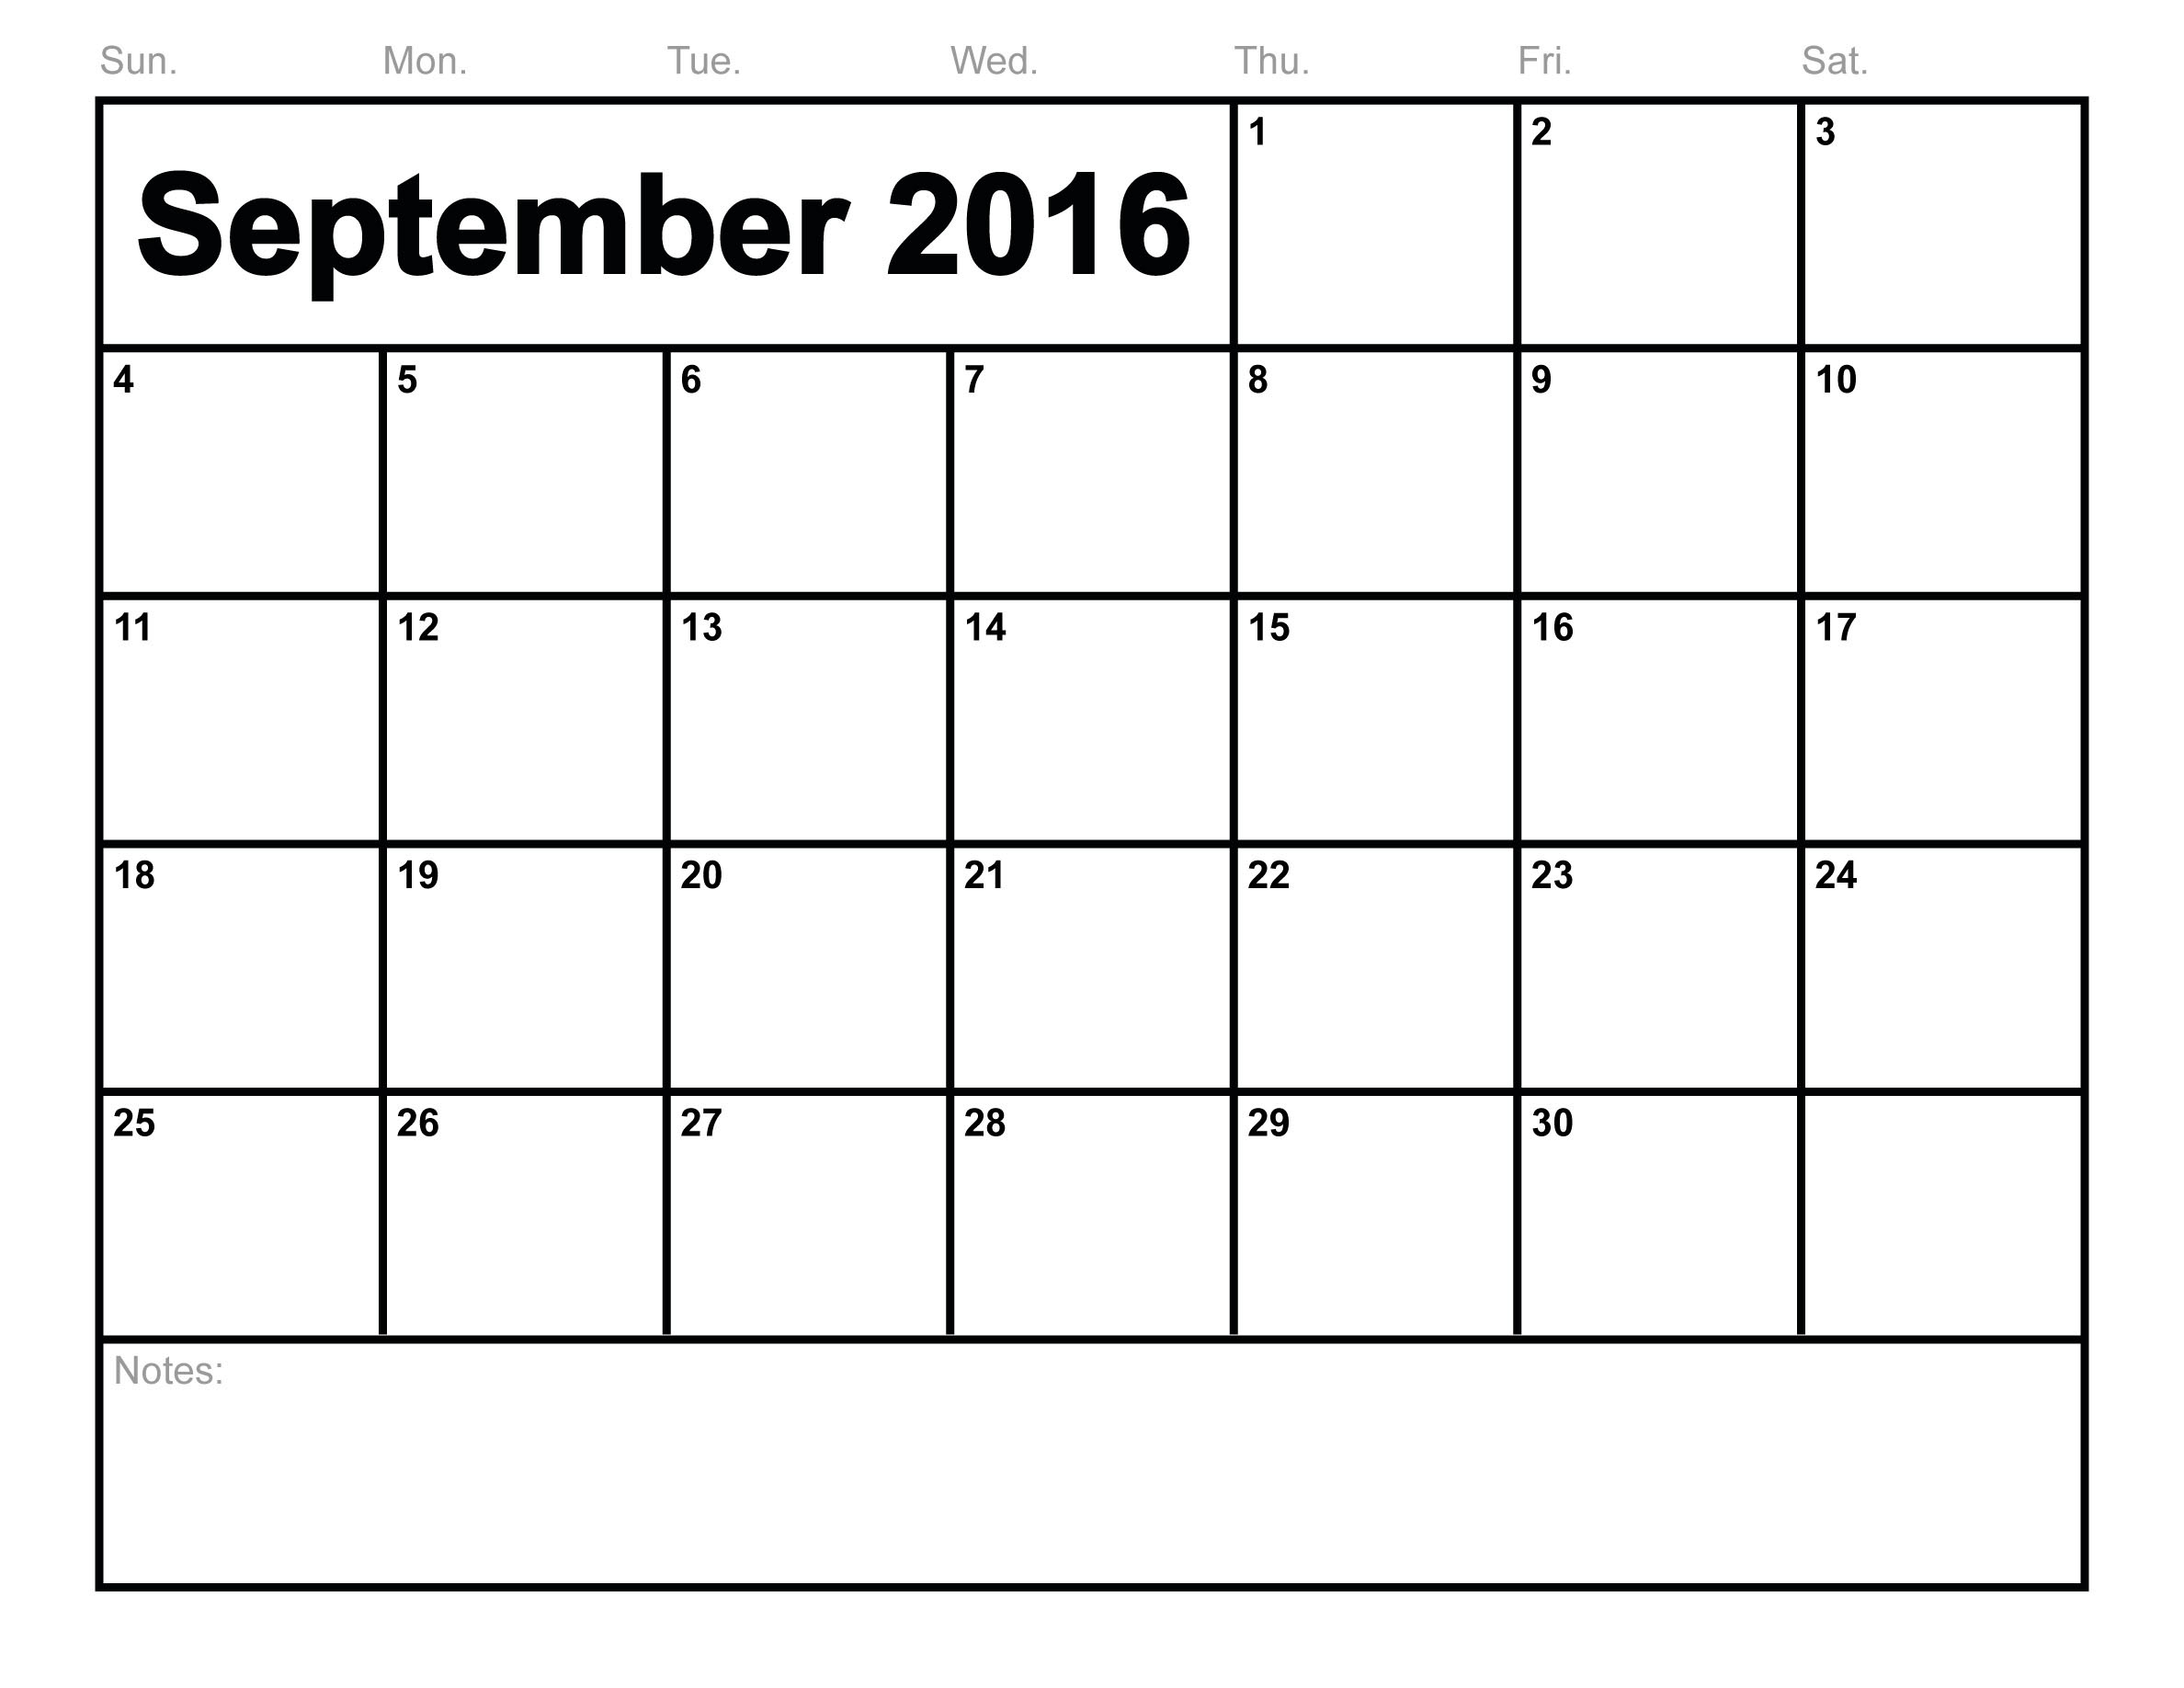 2018 September Printable Calendar Free, Blank Templates Pdf within Blank Printable Calendar Free